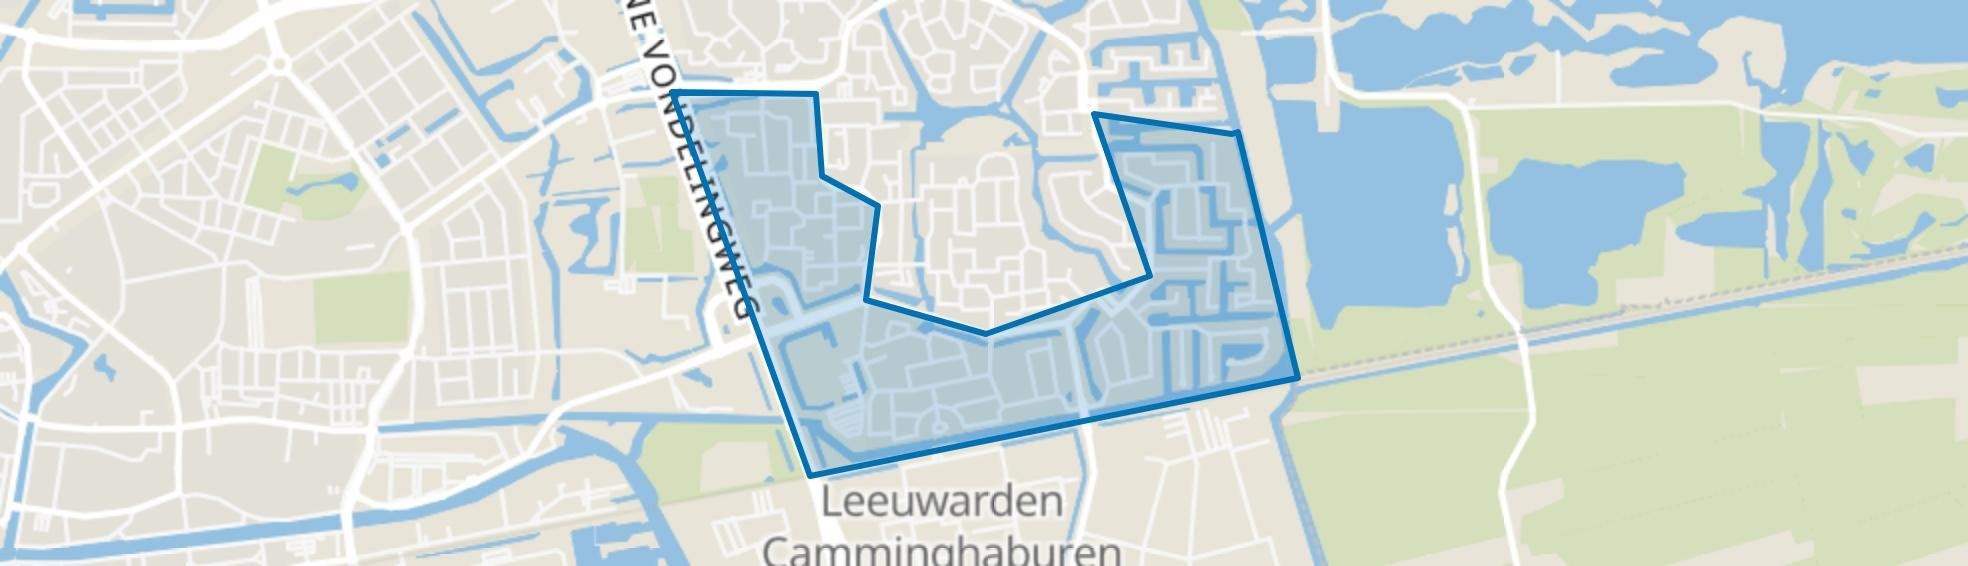 Camminghaburen-Zuid, Leeuwarden map